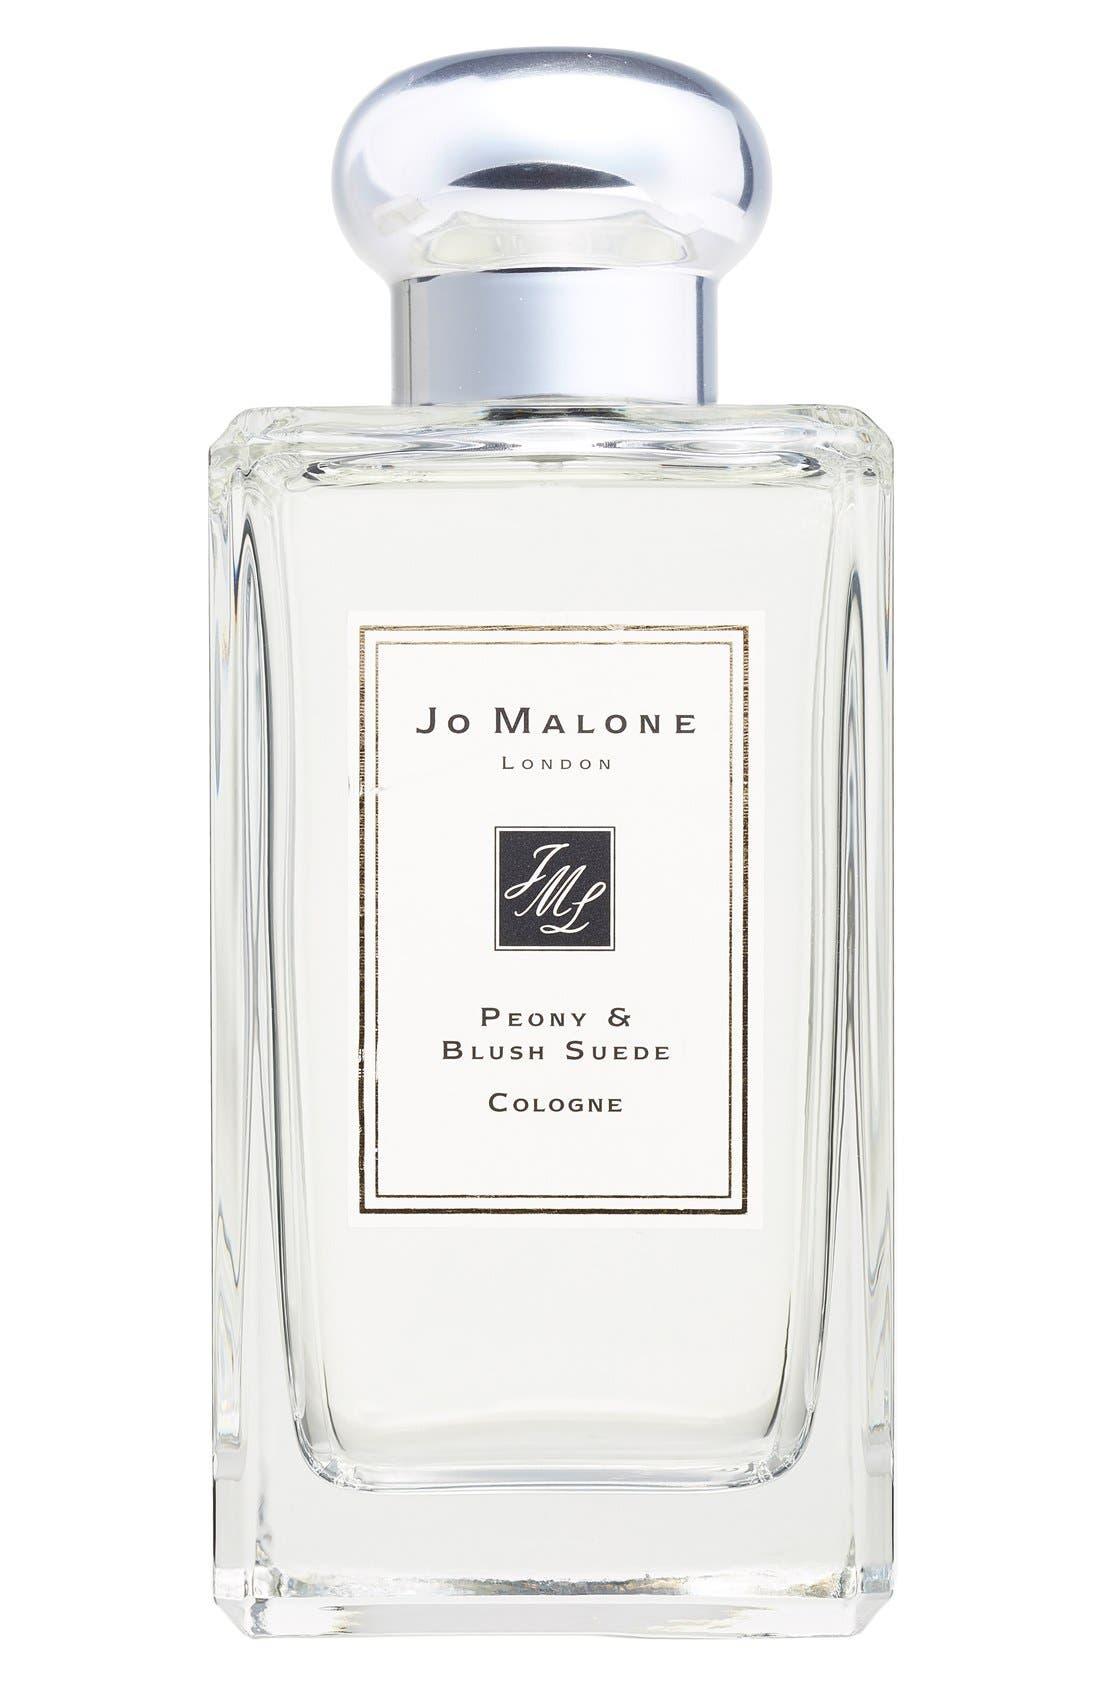 Jo Malone™ 'Peony & Blush Suede' Cologne (6.8 oz.)